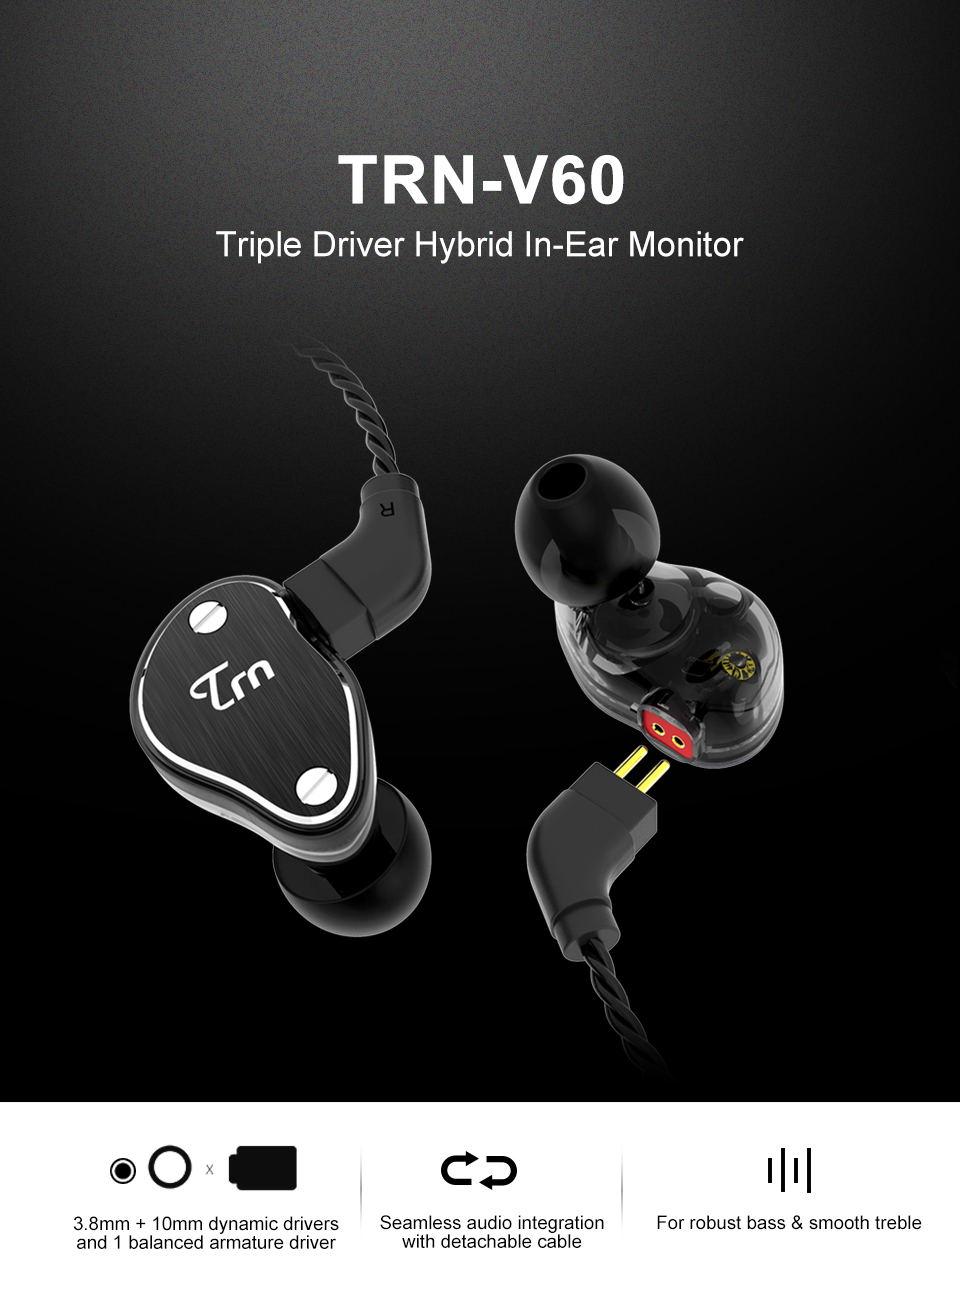 TRN V60 (มีไมค์) (แถมBigBagกันกระแทก) (เบสหนัก) สาย 4Core หูฟัง Hybrid 2 ไดร์เวอร์ (2 Balance Amature + 1 Dynamic ต่อข้าง) สีน้ำเงิน